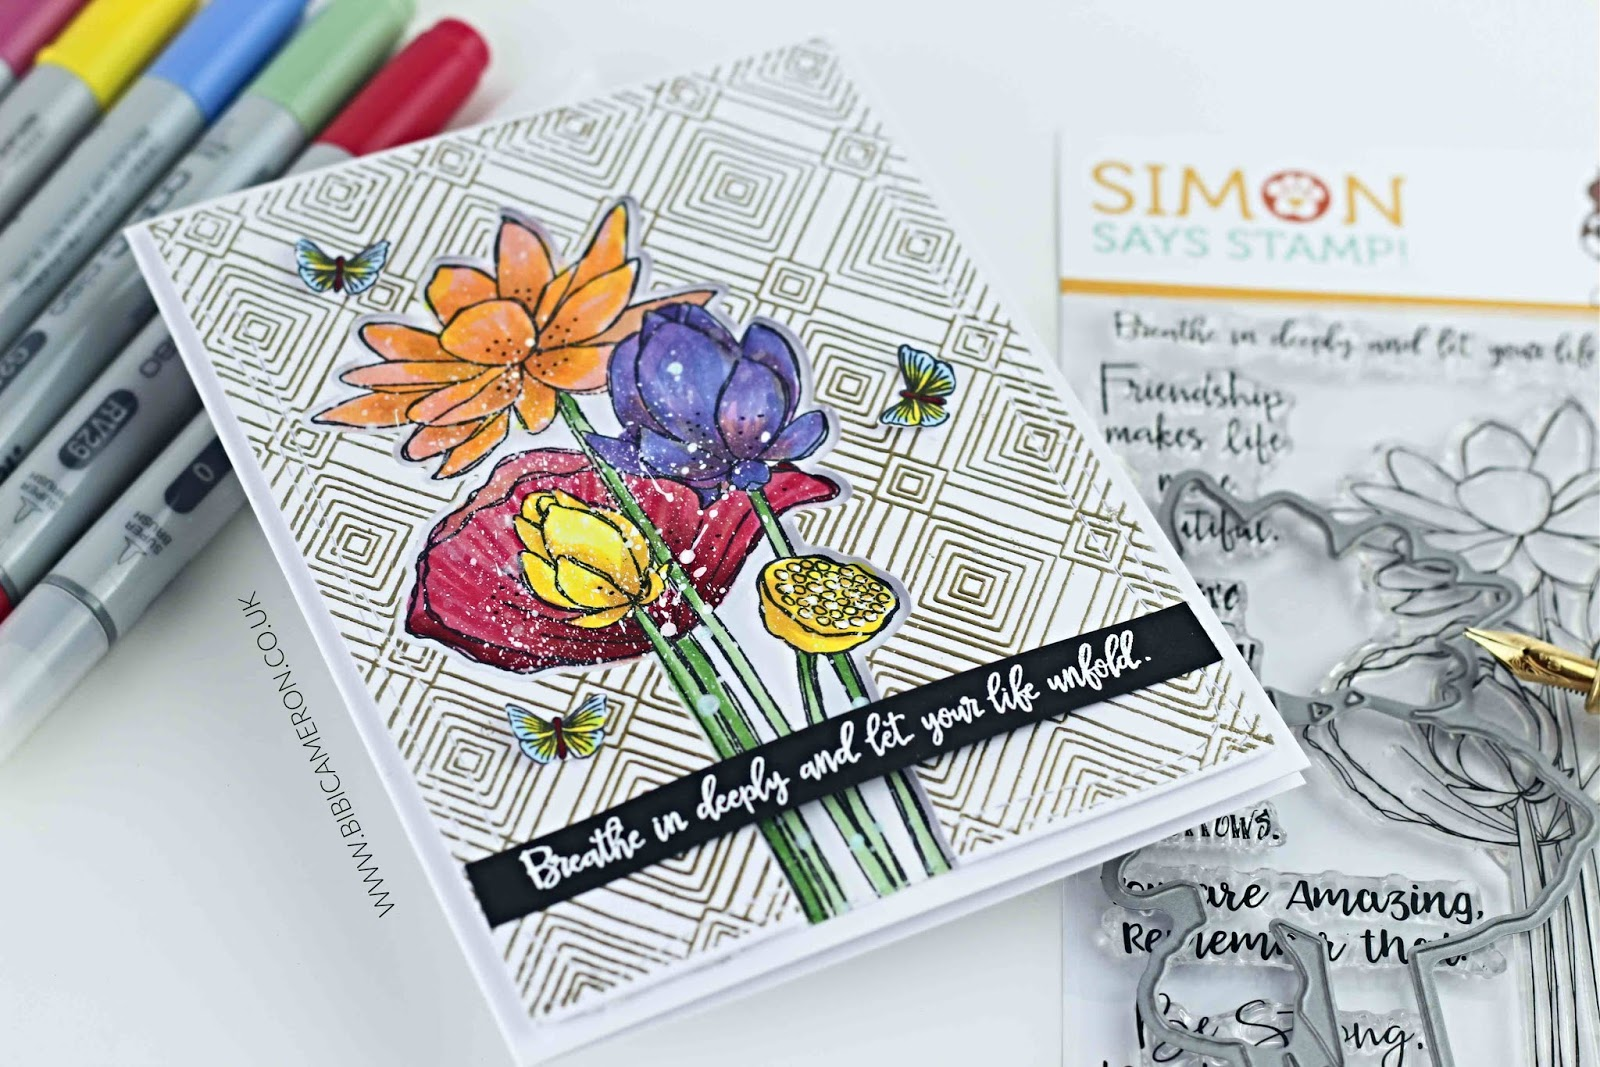 Sketch lotus flowers simons says stamps sssfriendlyfrolic bibi sketch lotus flowers simons says stamps sssfriendlyfrolic izmirmasajfo